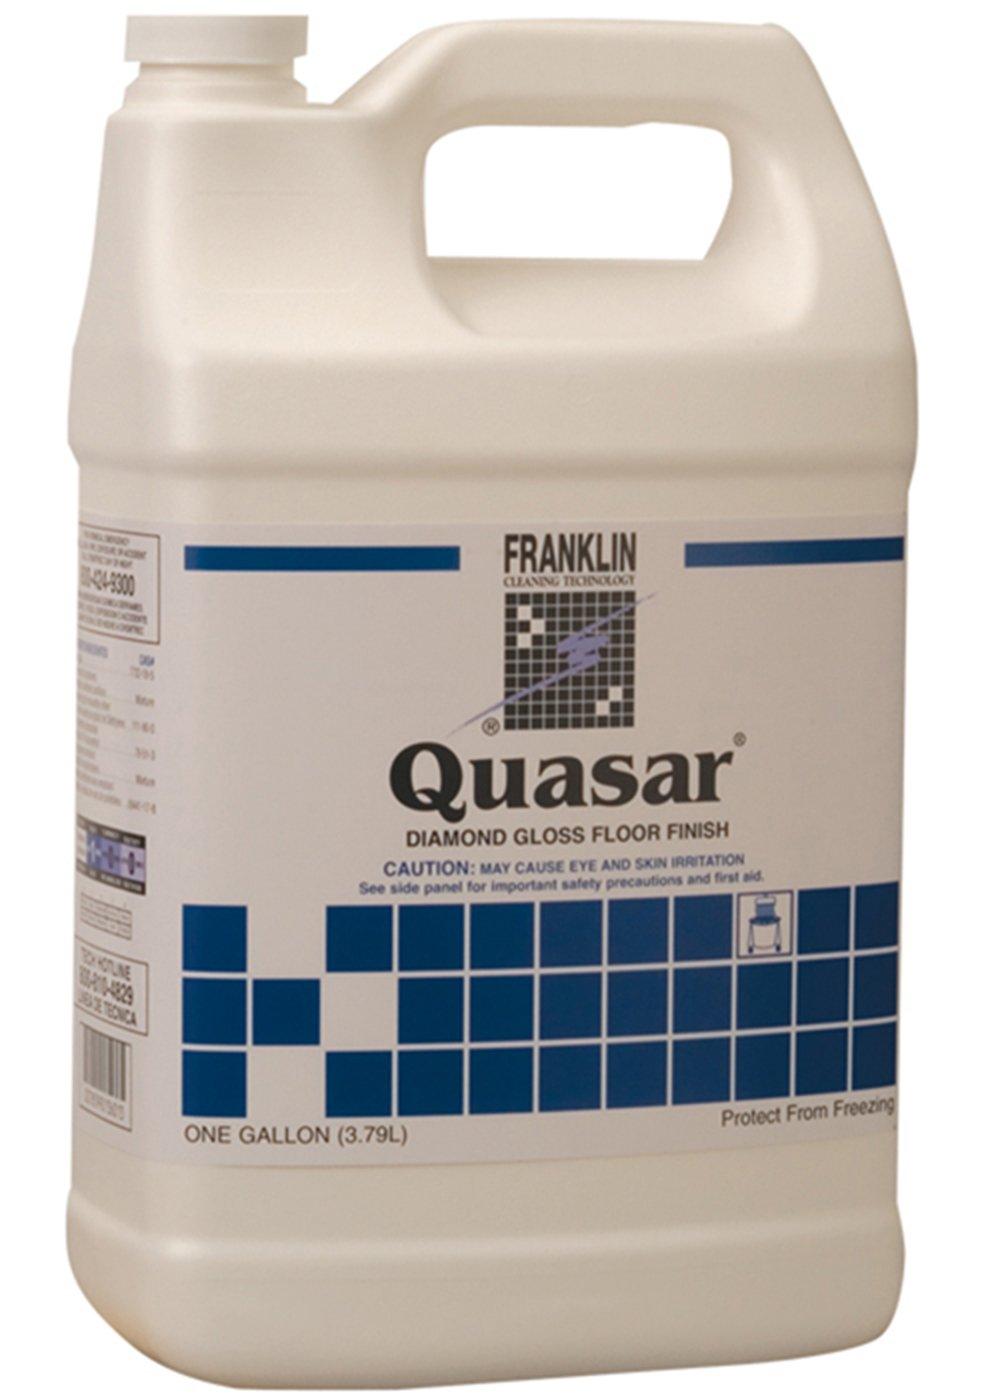 Franklin Cleaning Technology F136022 Quasar Diamond Gloss Floor Finish, 1 Gallon (Pack of 4)